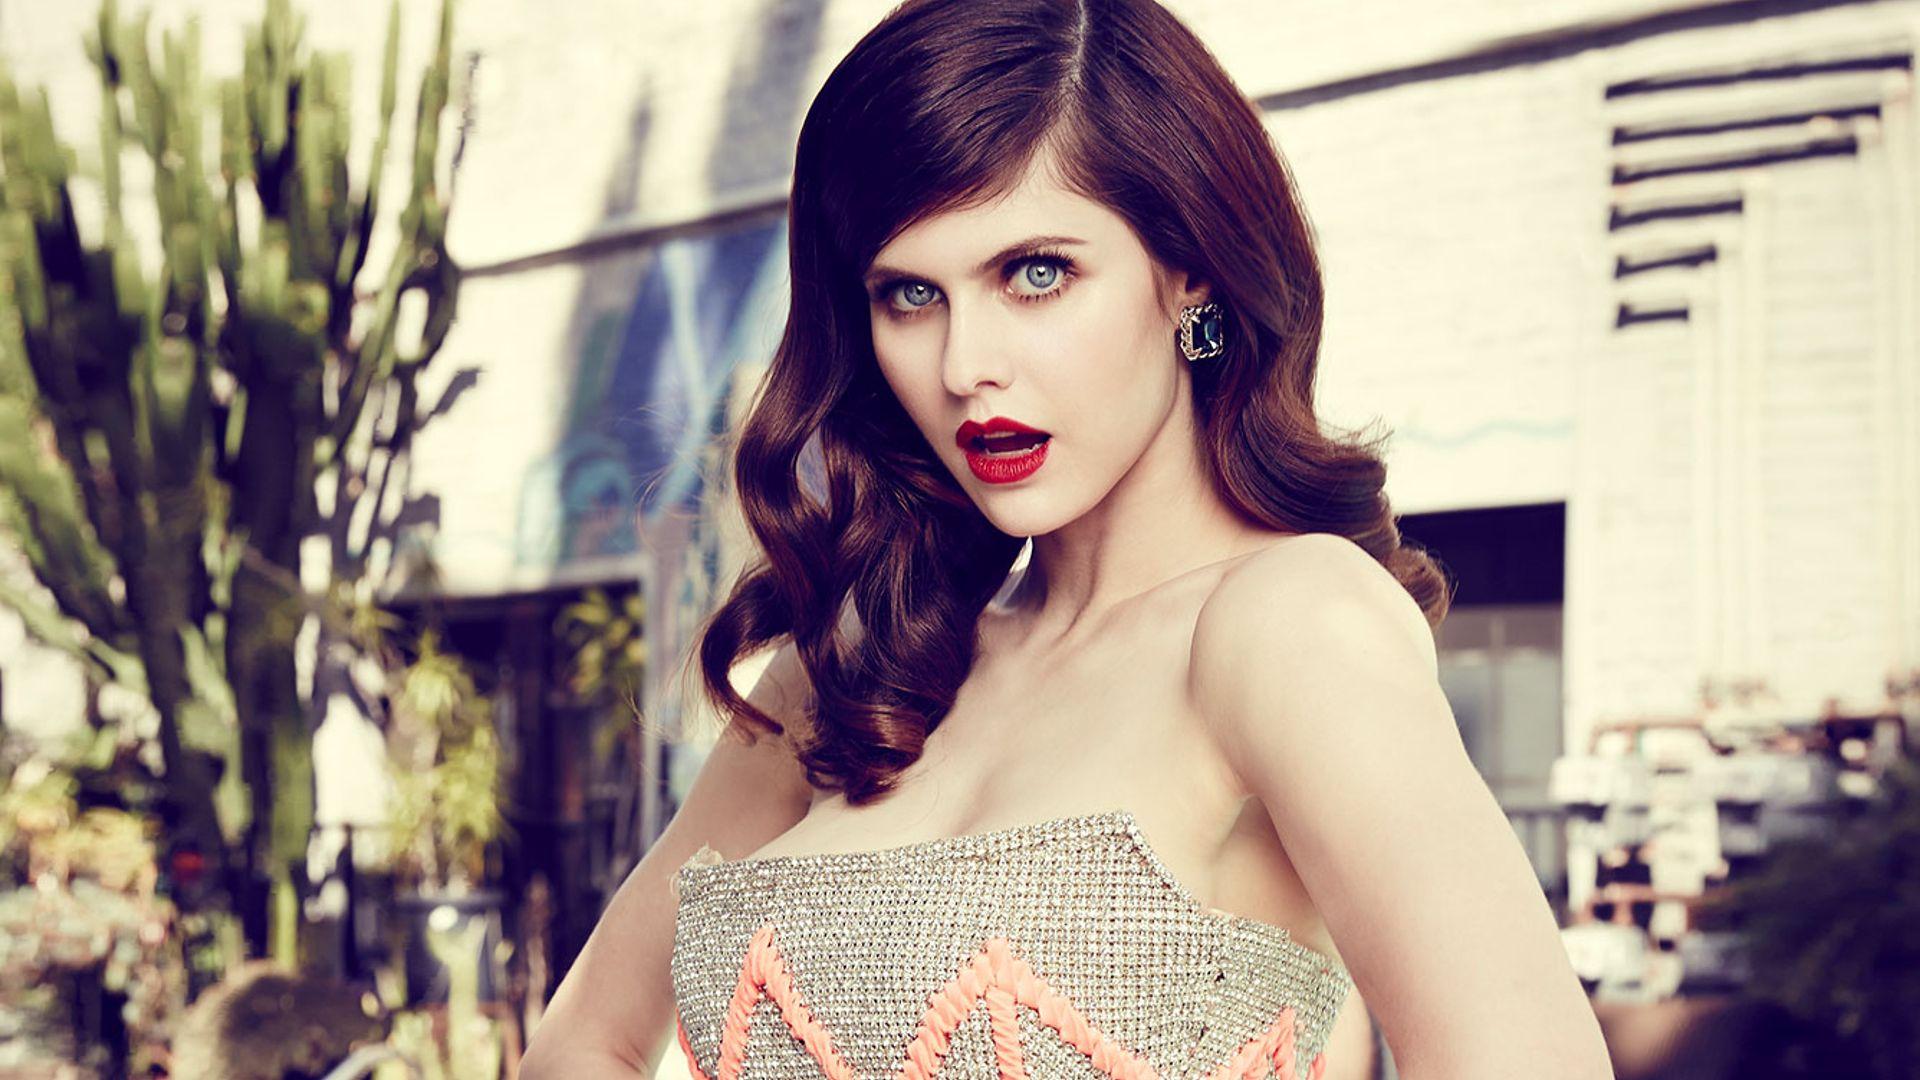 Red Lips Beauty Alexandra Daddario Model Wallpaper